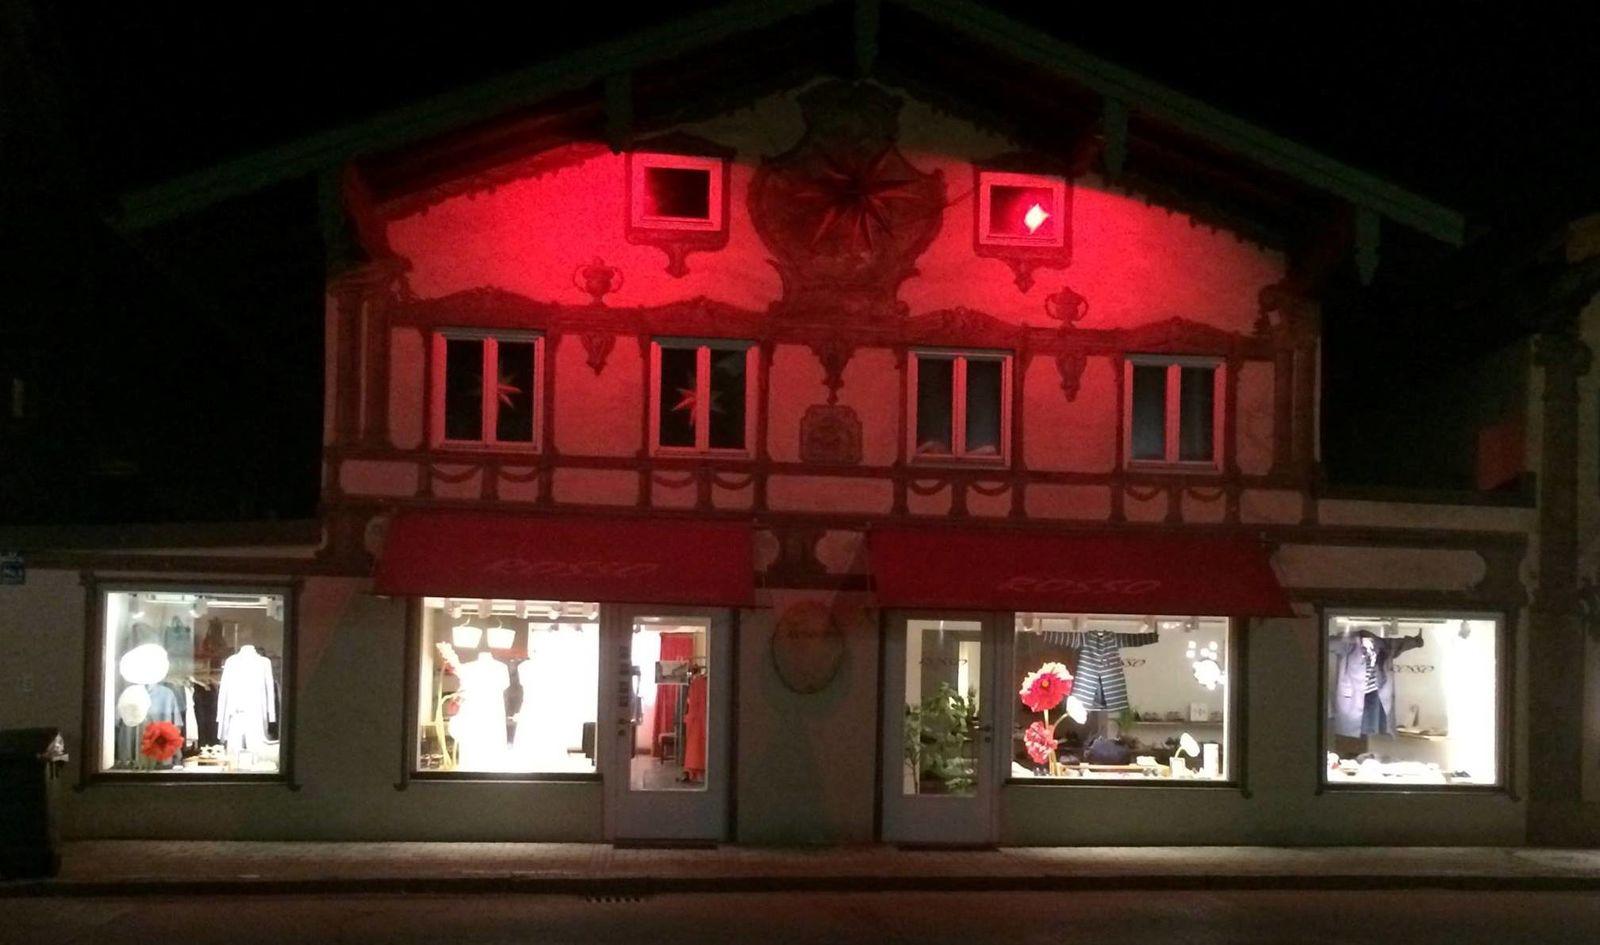 ROSSO Mode & Schuhe Prien am Chiemsee in Prien (Bild 10)